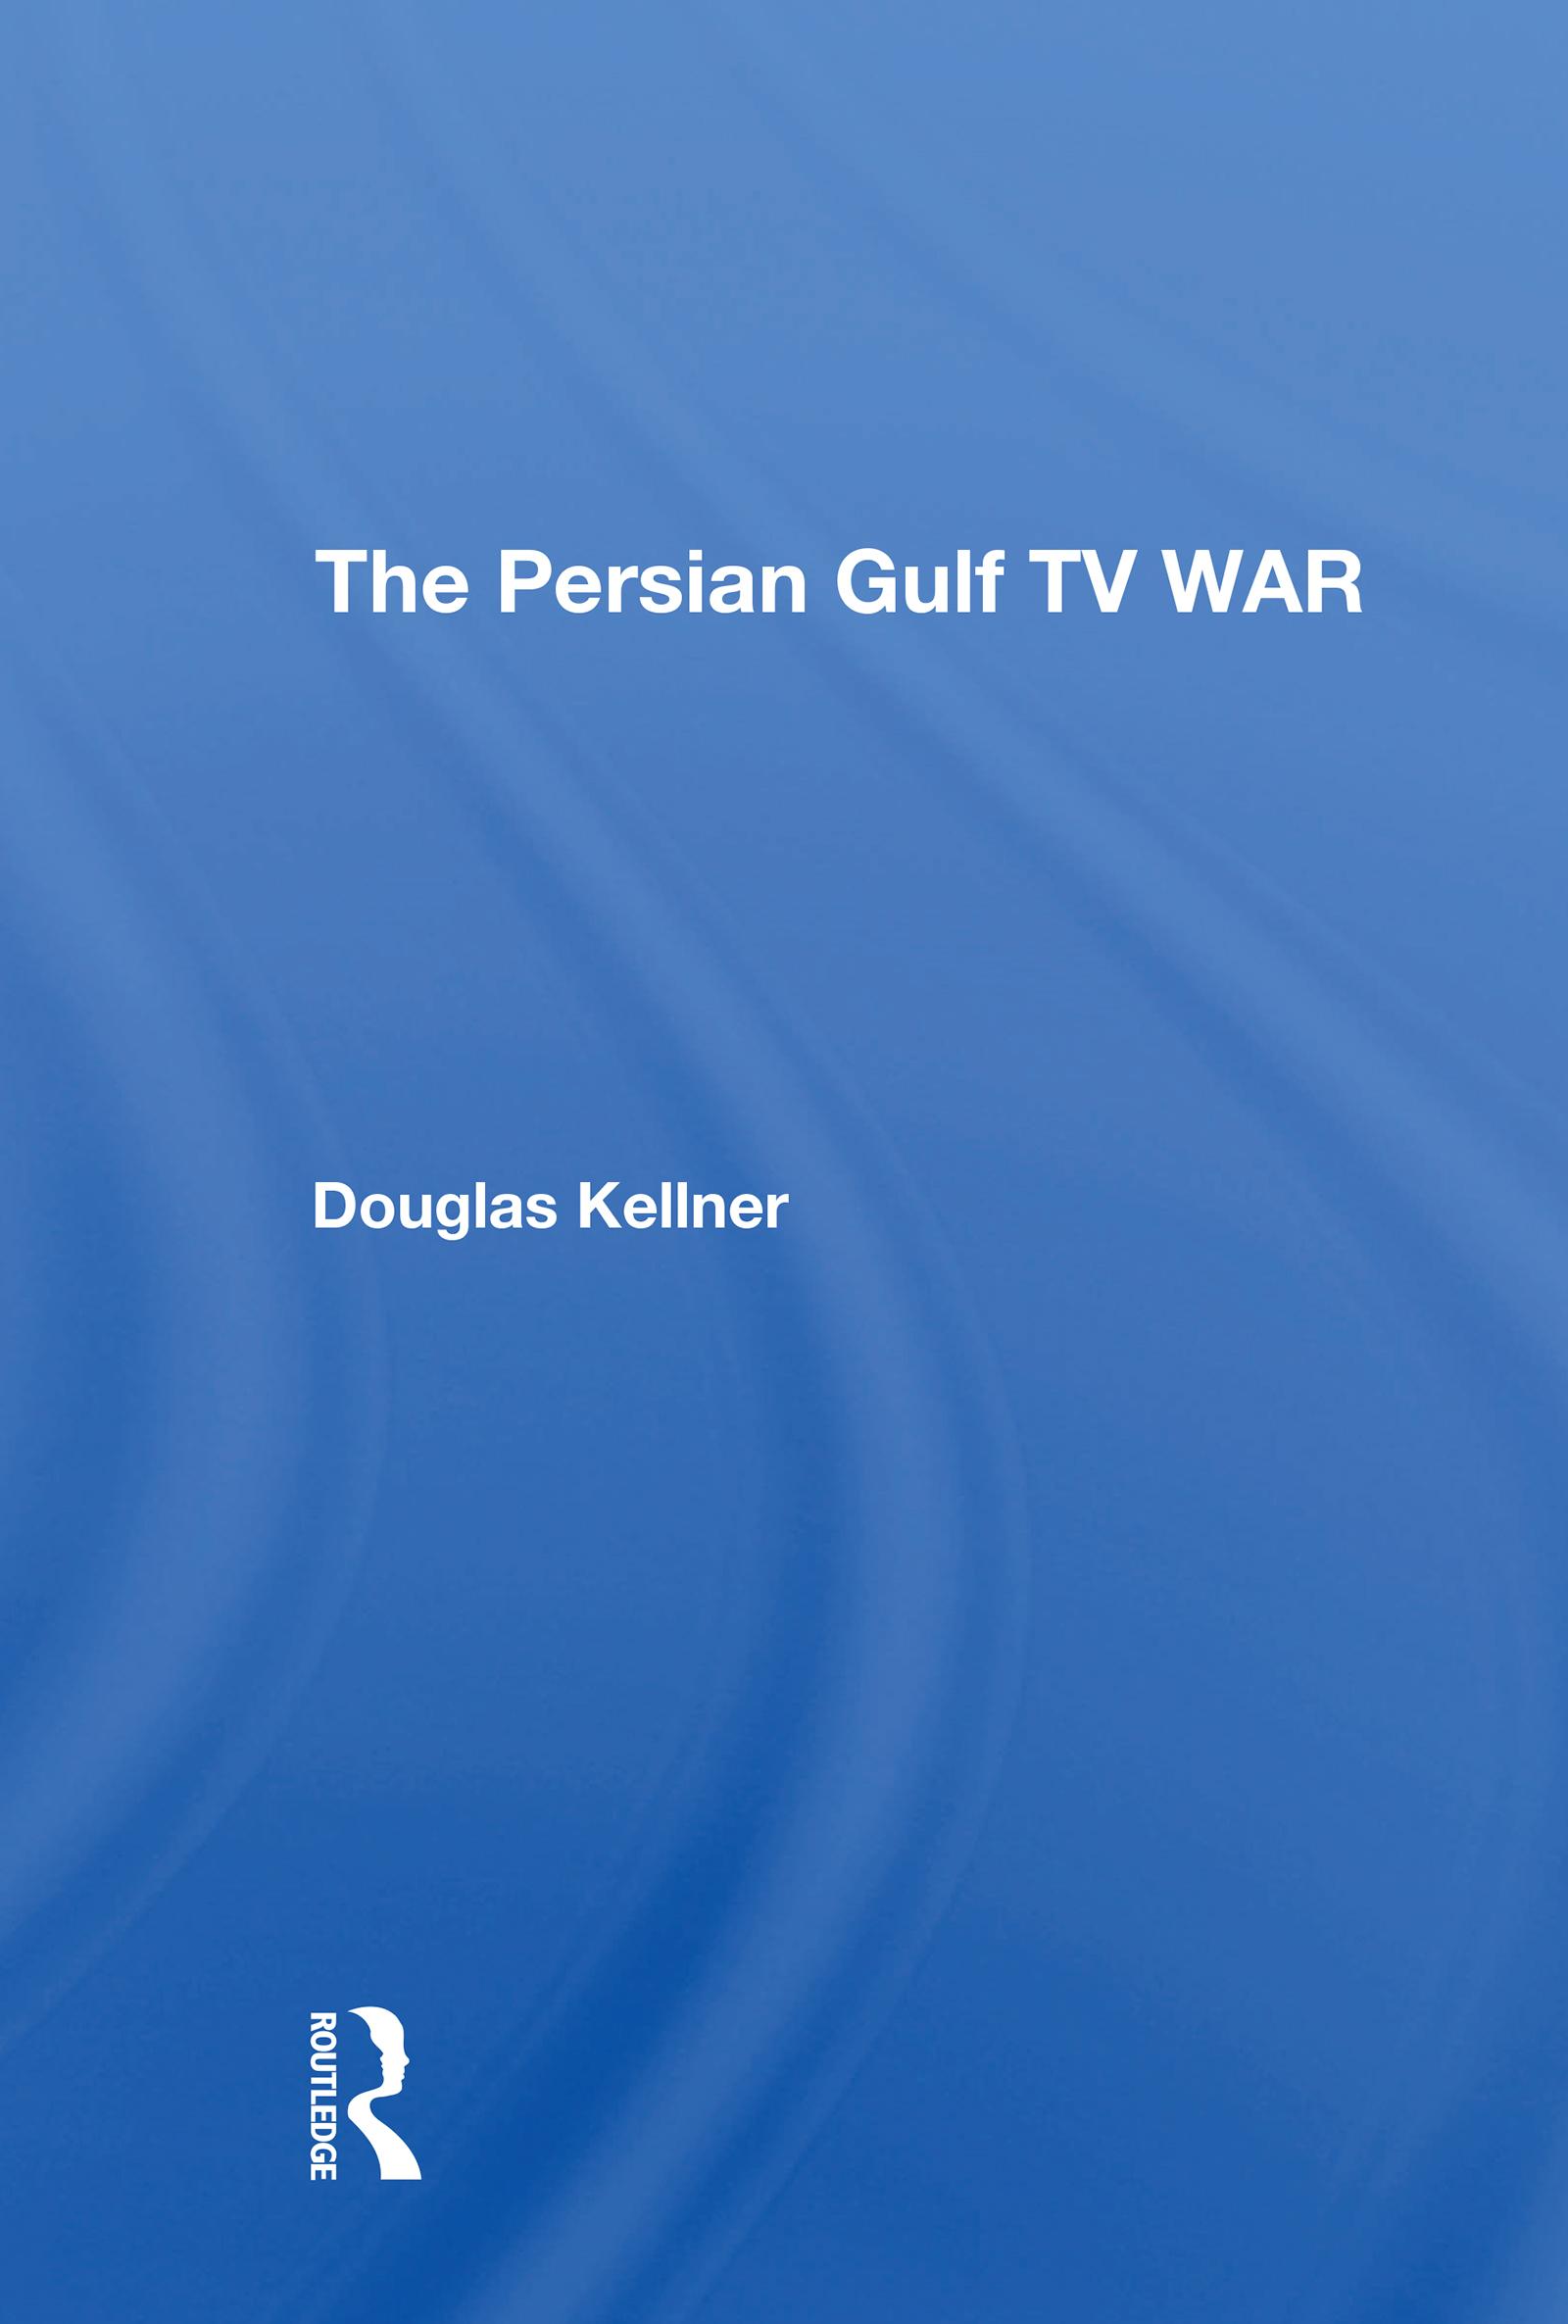 The Persian Gulf TV War